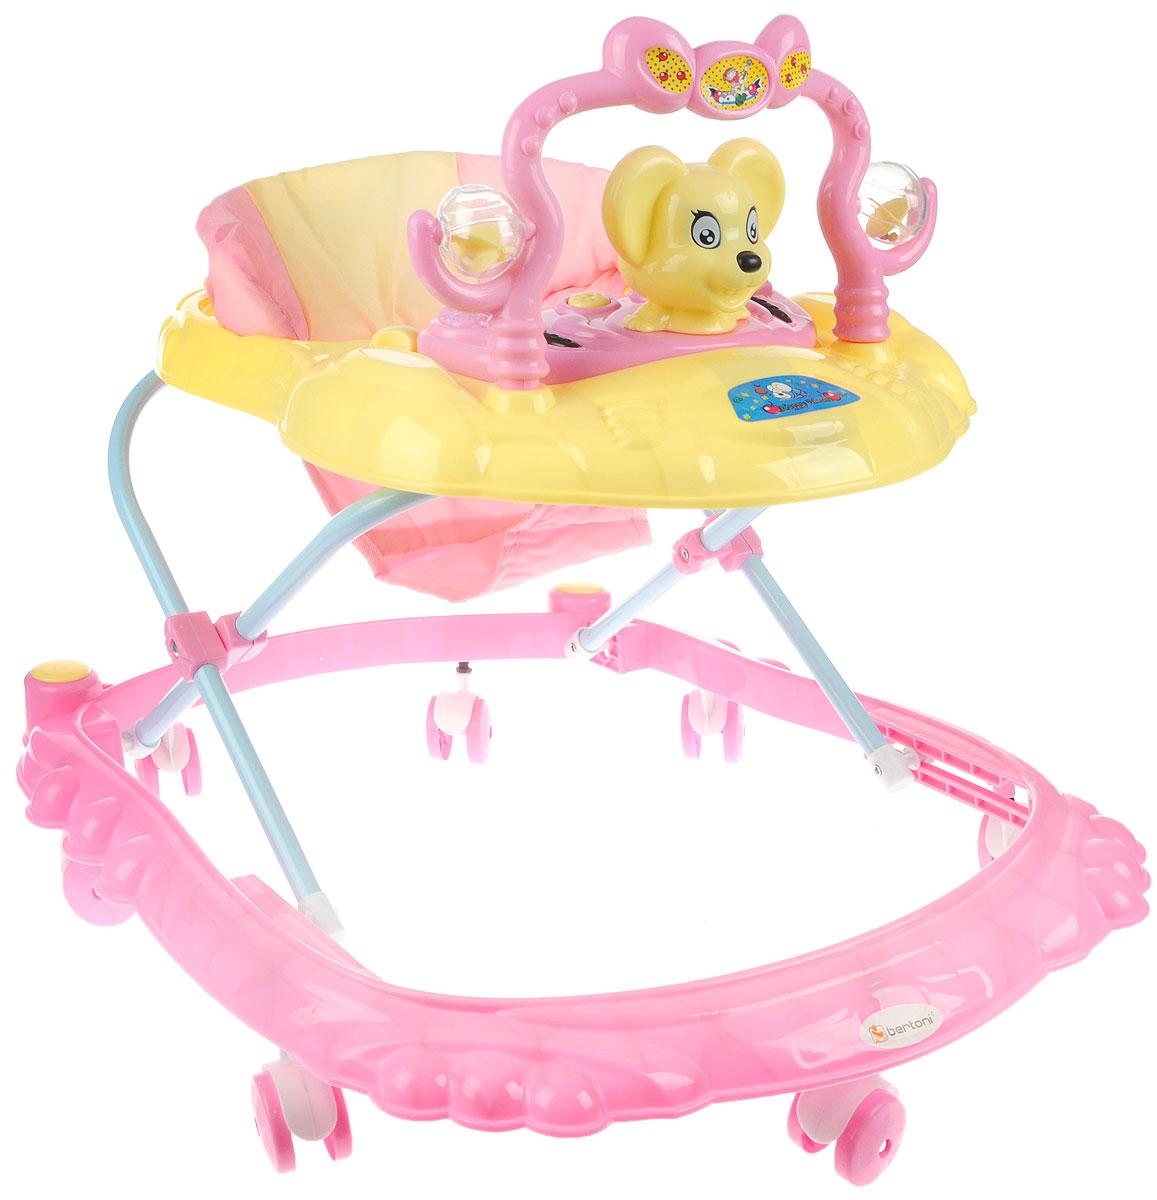 Bertoni Ходунки BW 2808 цвет розовый желтый -  Ходунки, прыгунки, качалки